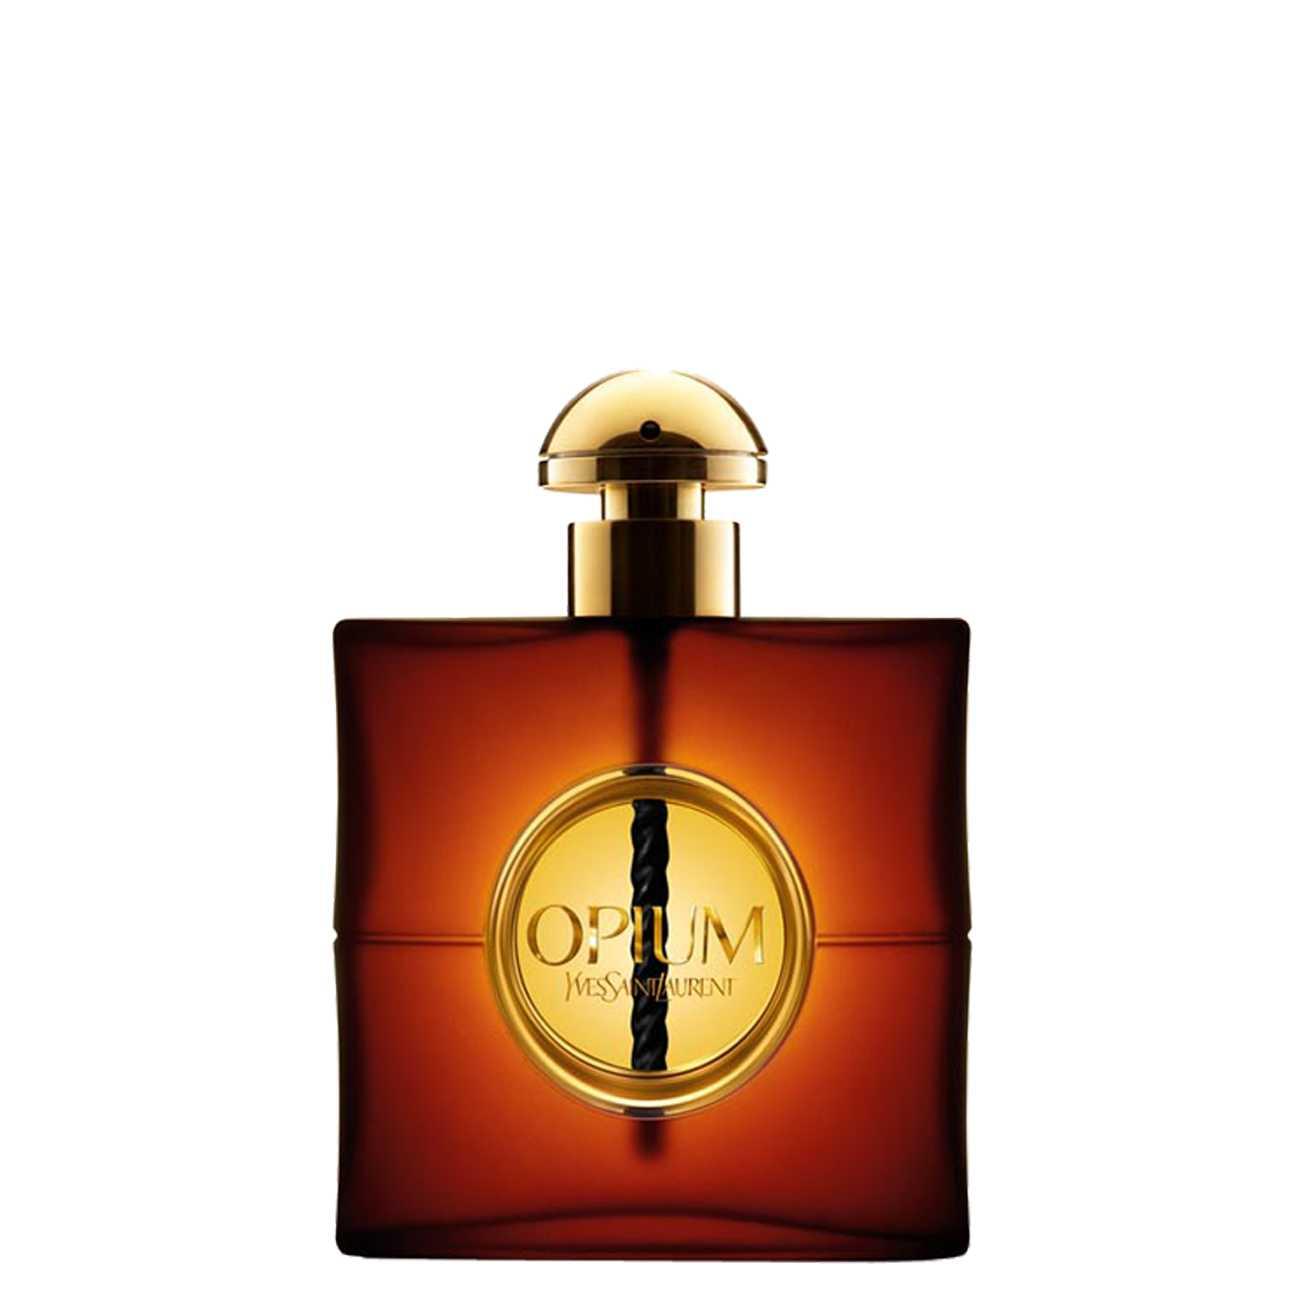 Opium 50 Ml 50ml Yves Saint Laurent imagine 2021 bestvalue.eu